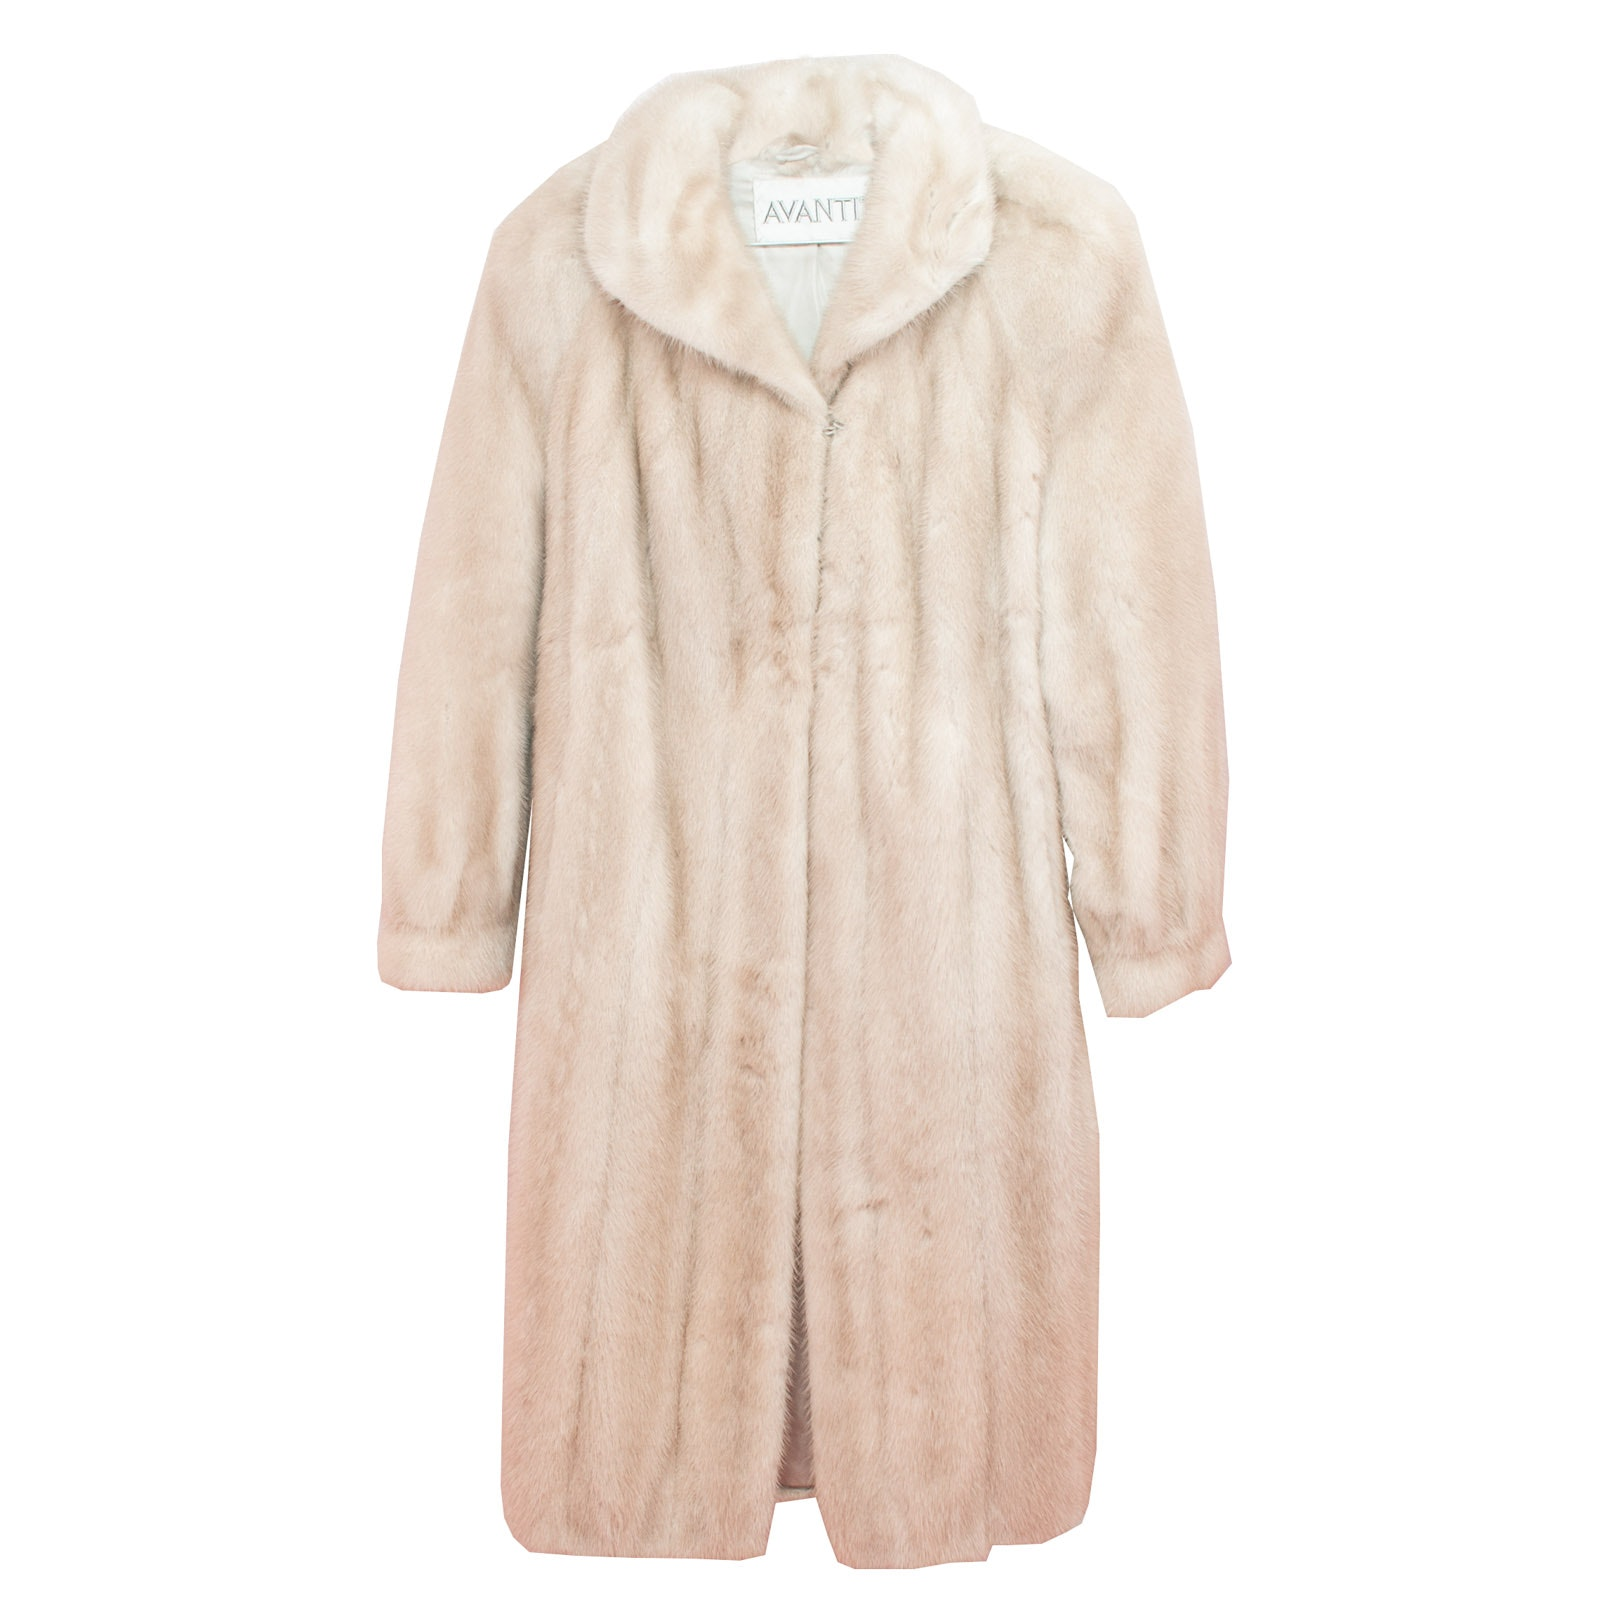 Avanti Light Blonde Mink Fur Coat